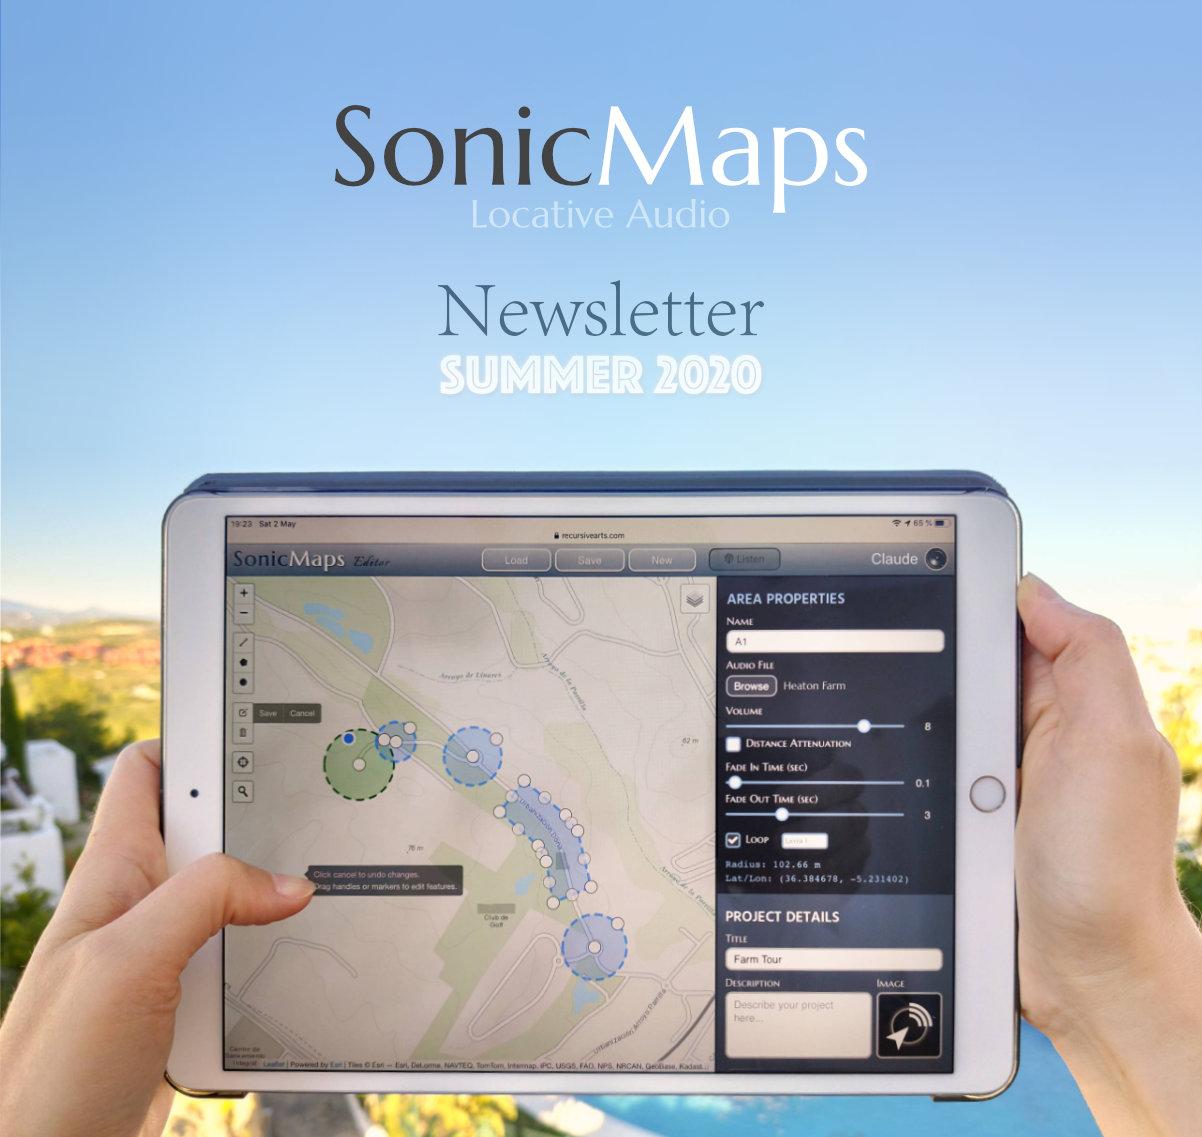 SonicMaps running on iPad